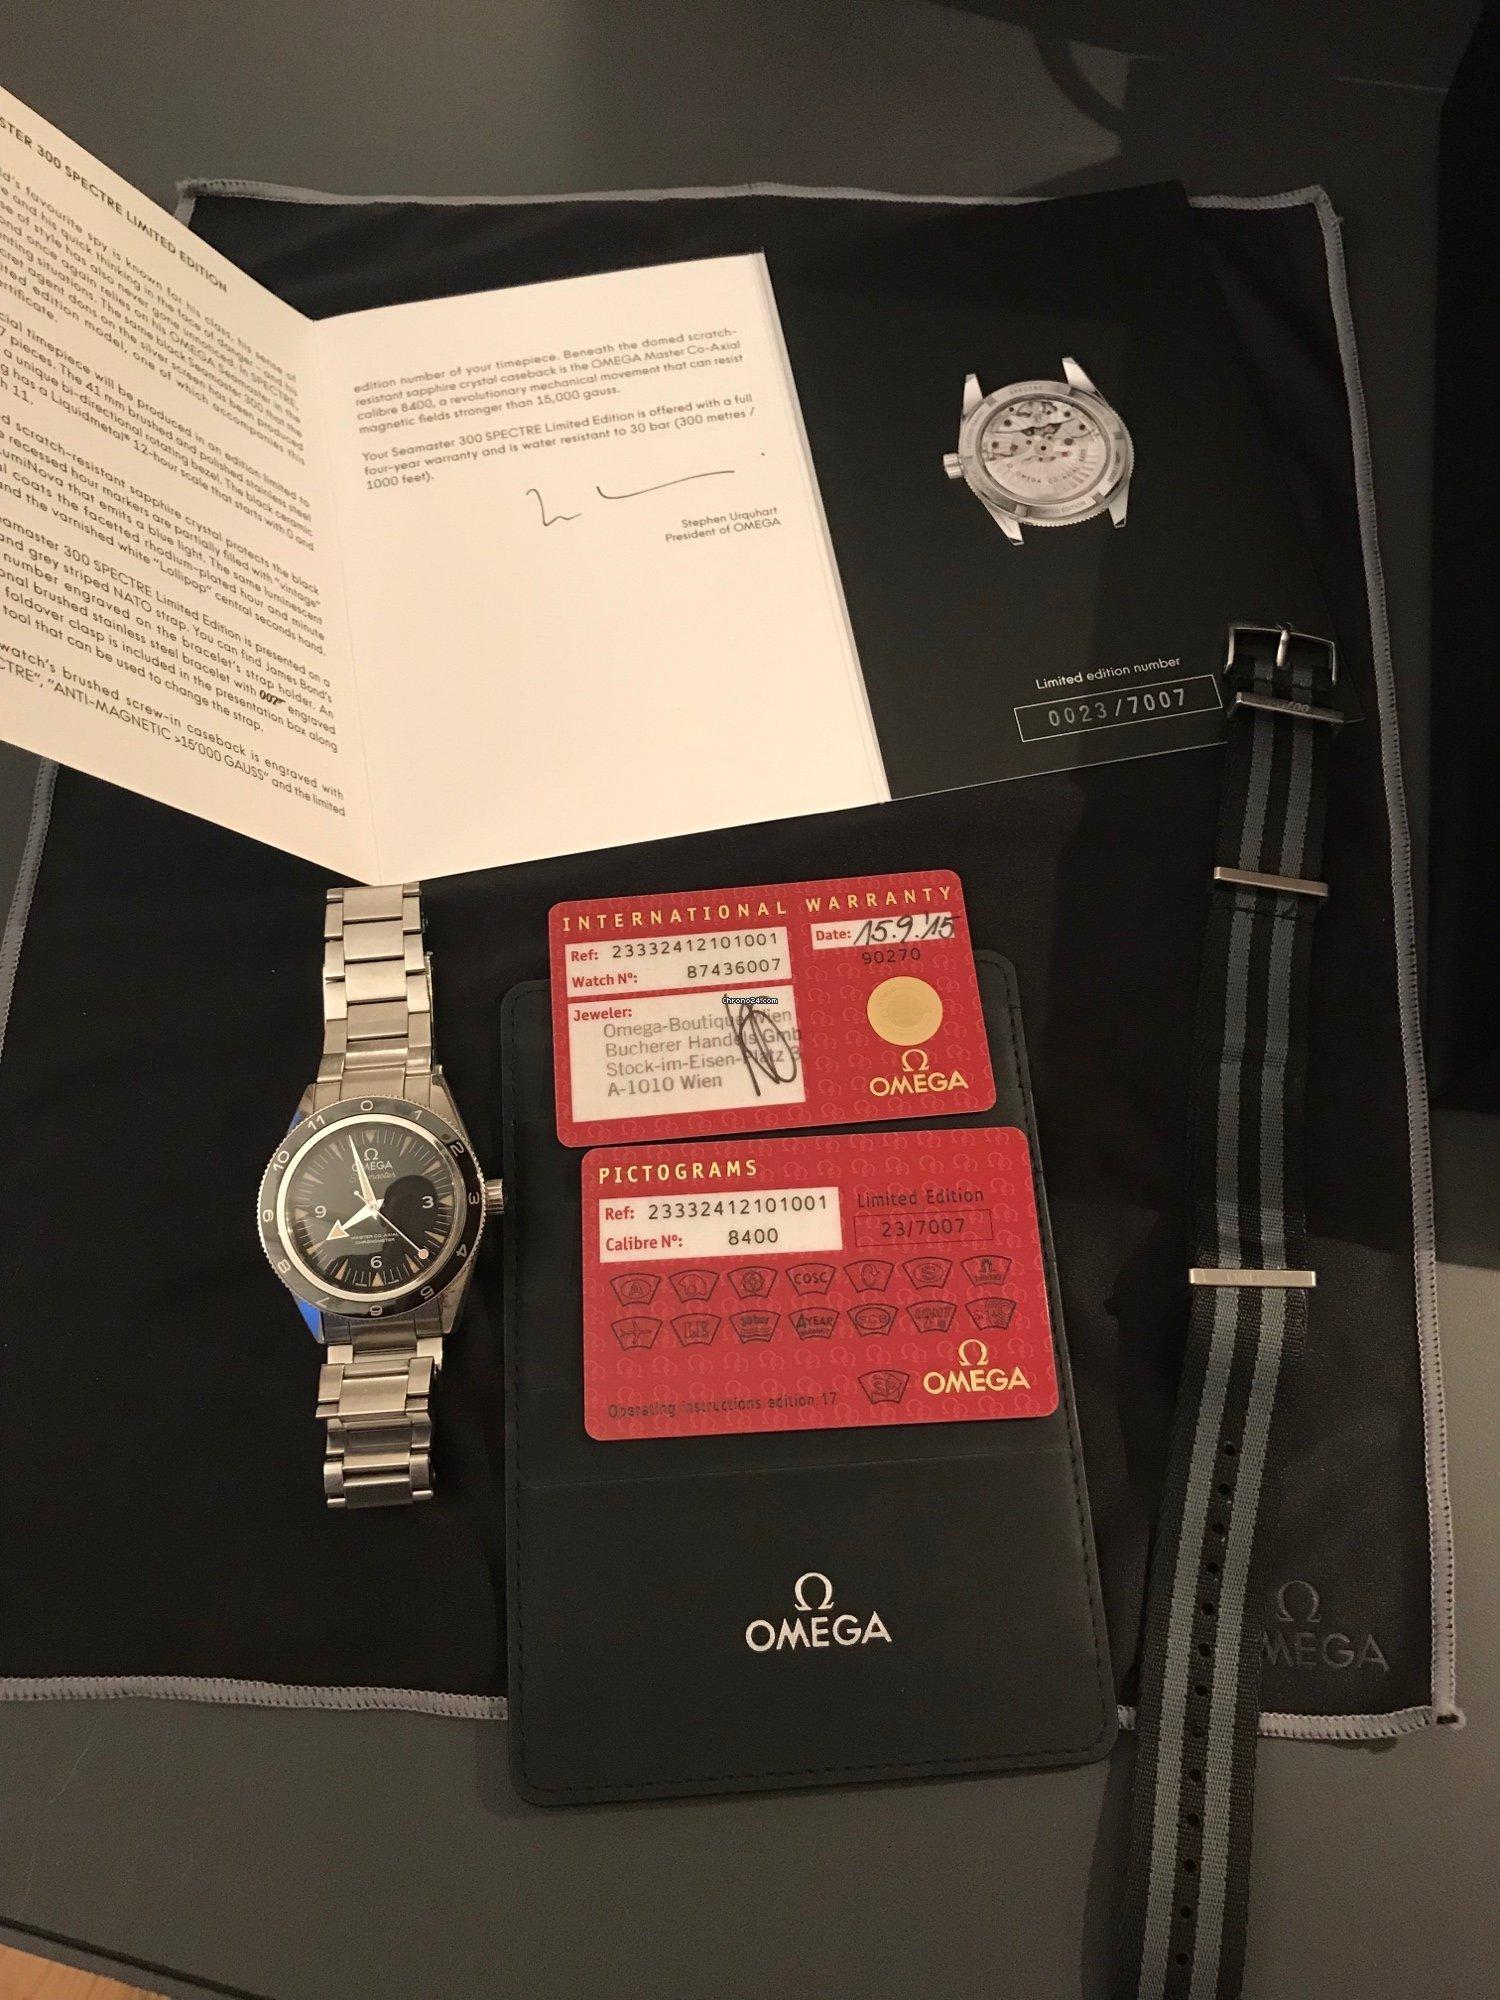 Omega Seamaster 300 SPECTRE (23 / 7007) for AU$ 11,632 for